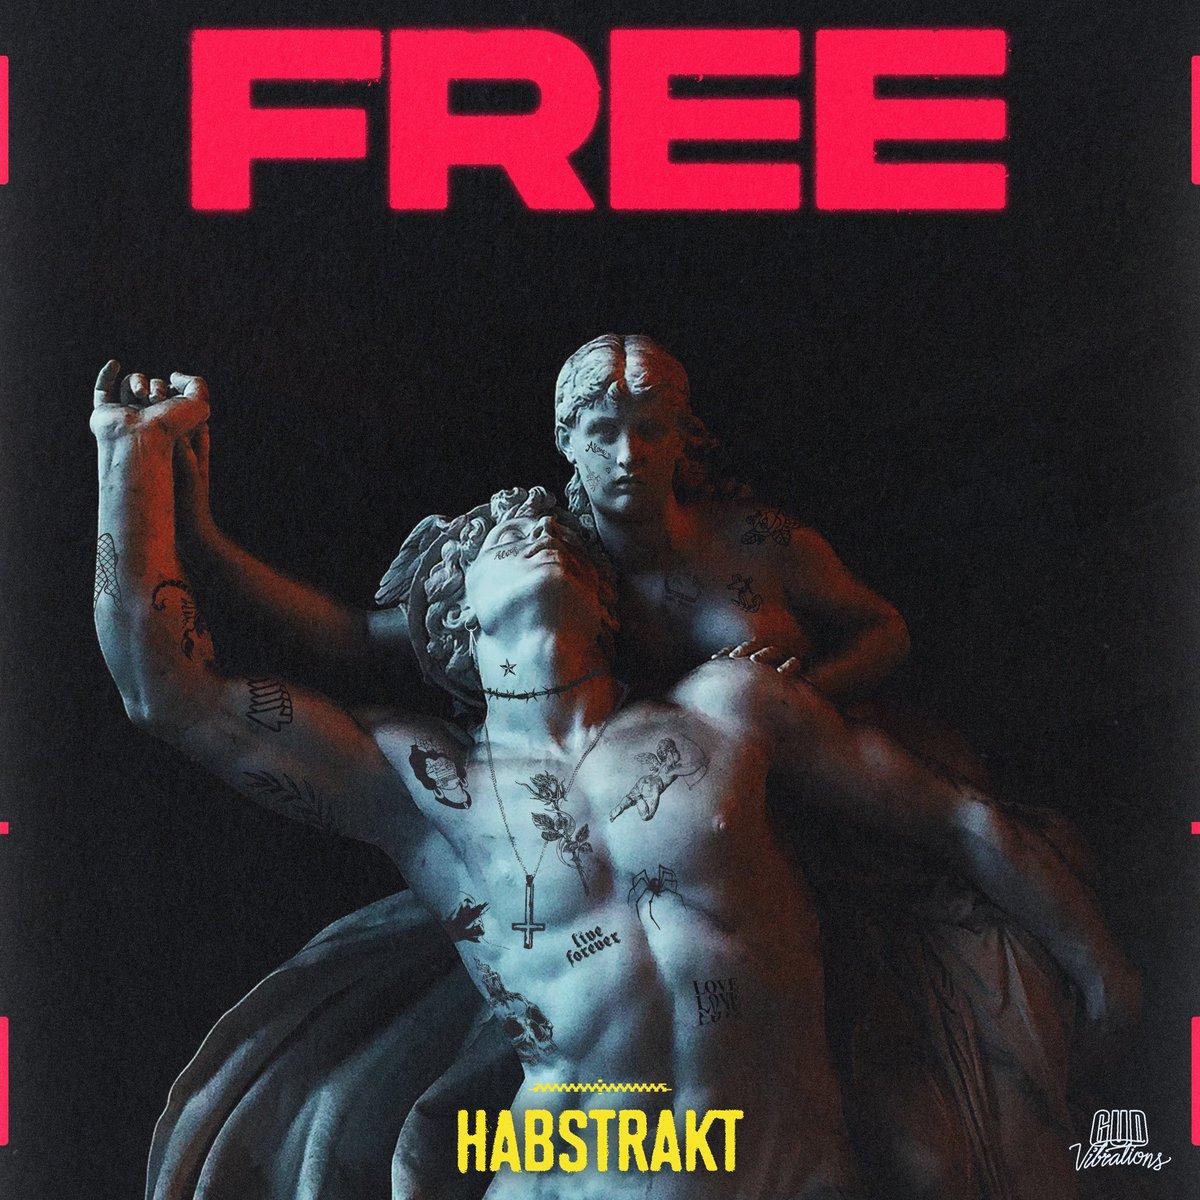 .@HABSTRAKT - FREEOUT ON 1/24PRESAVE: http://smarturl.it/gv021